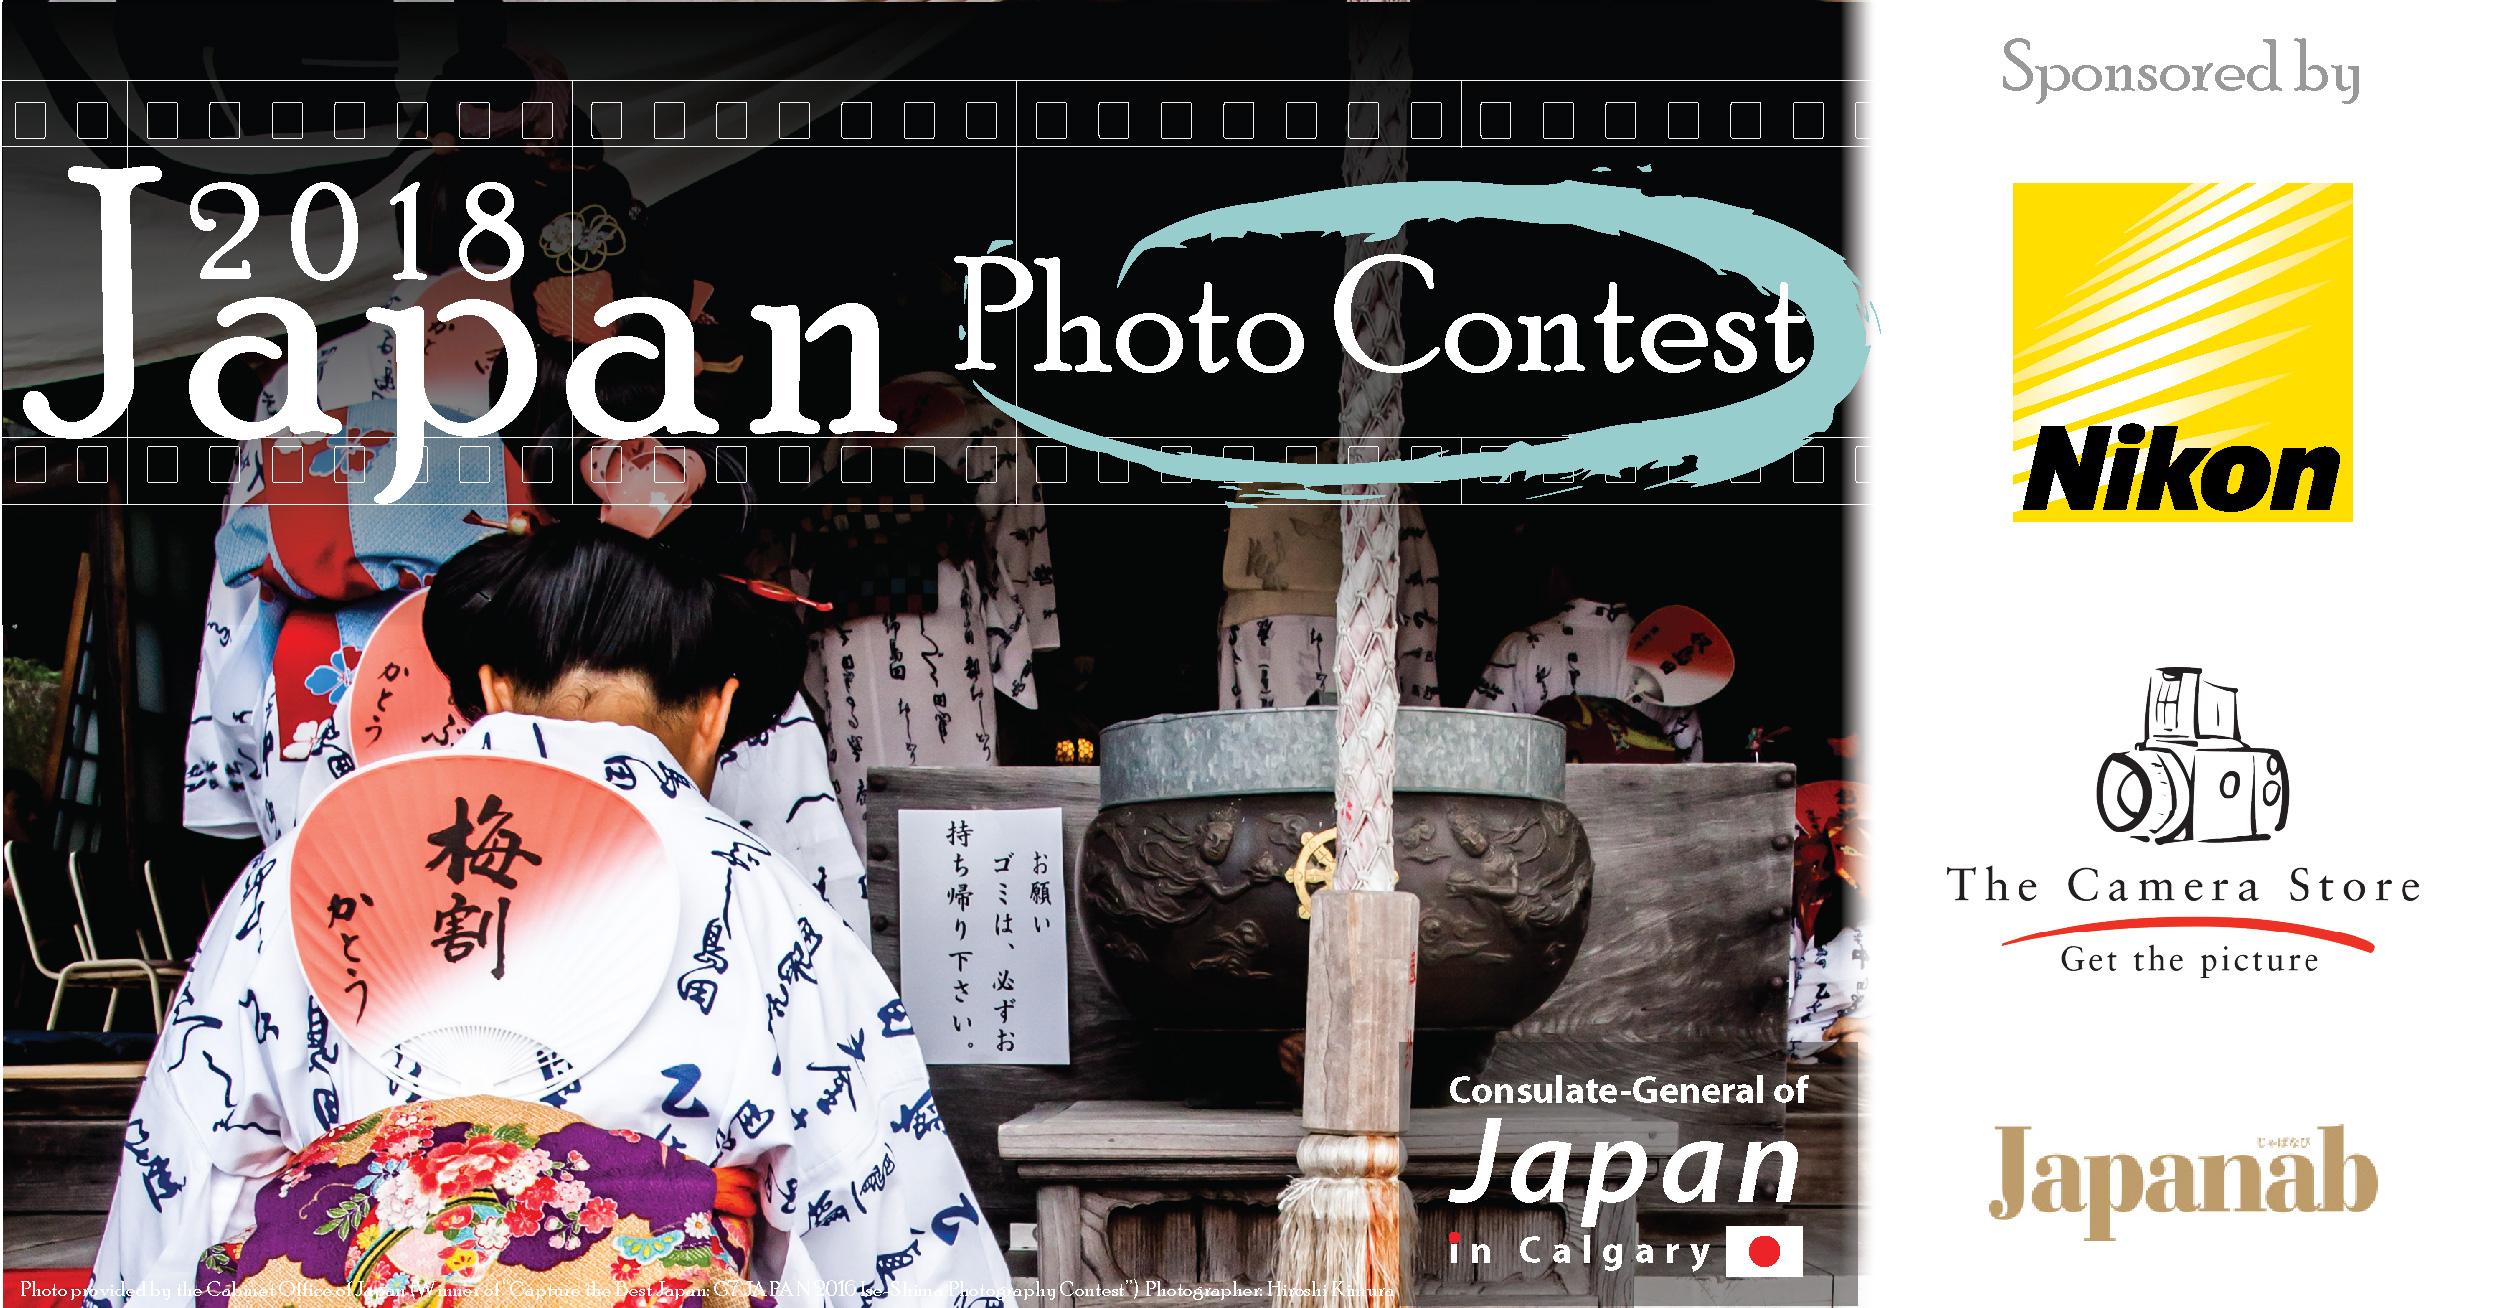 2018 Japan Photo Contest - logo